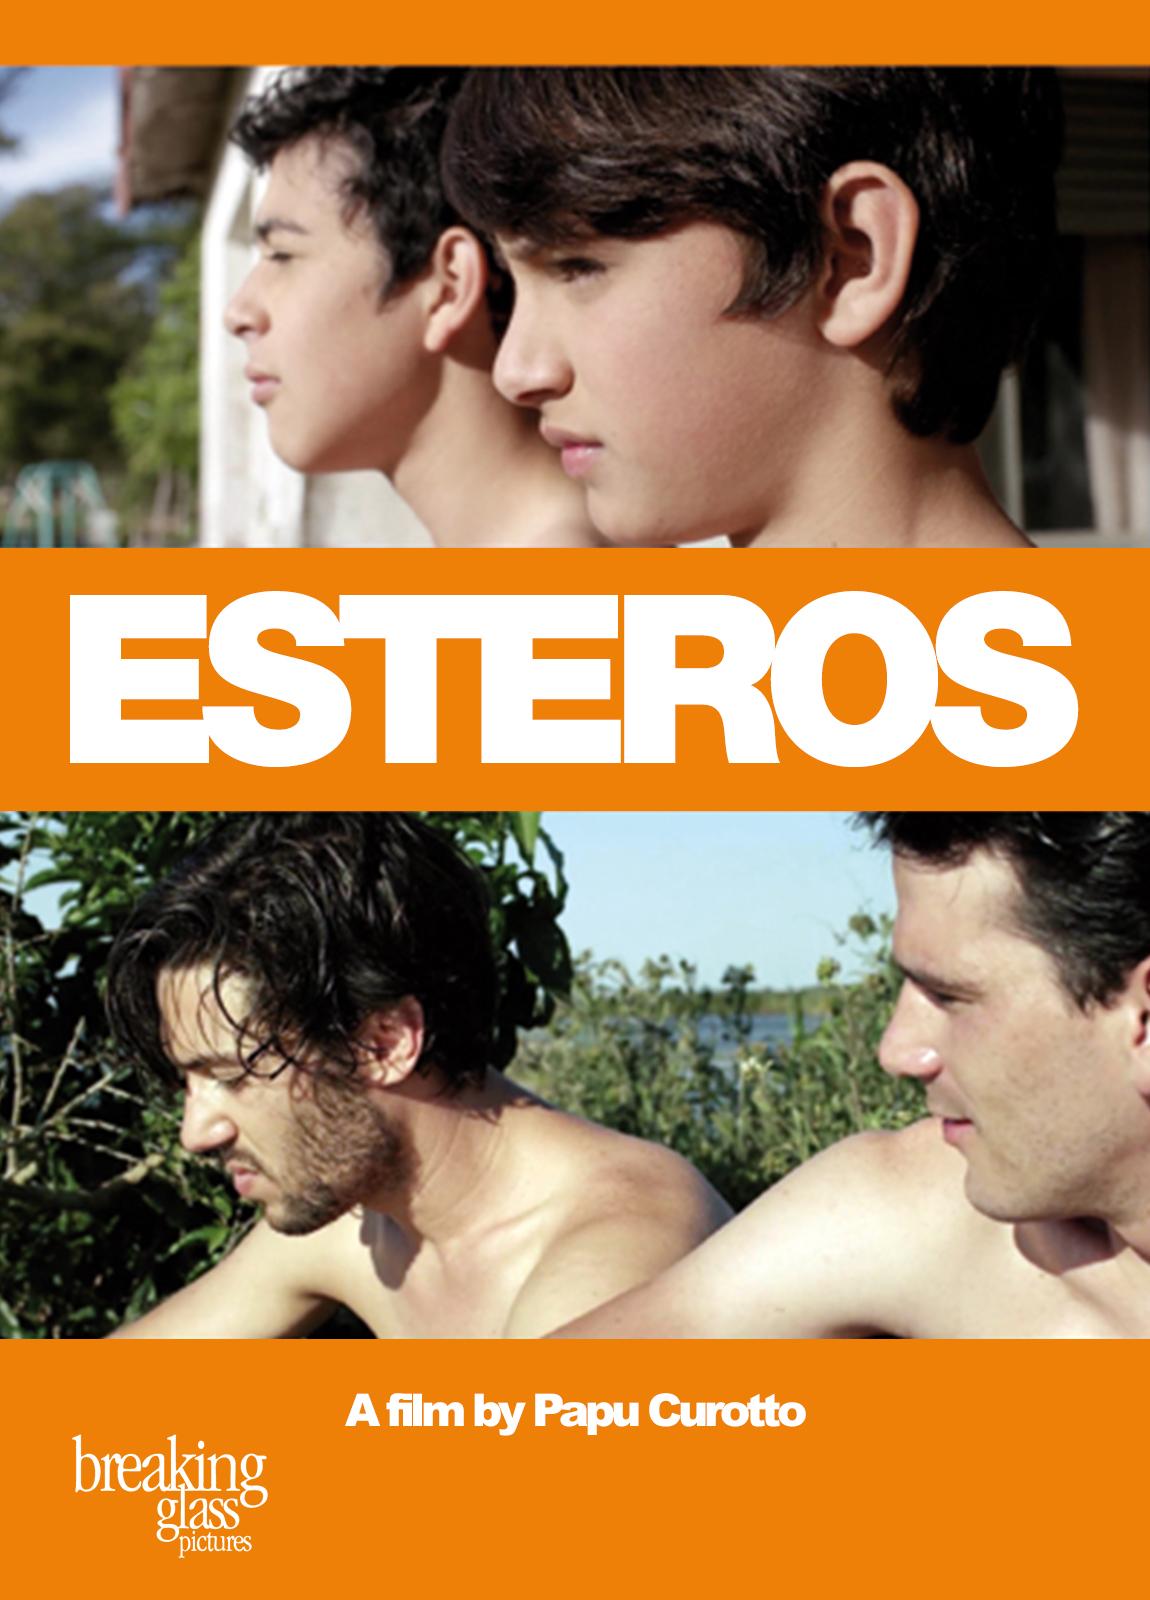 Peliculas Gay Spanish Online